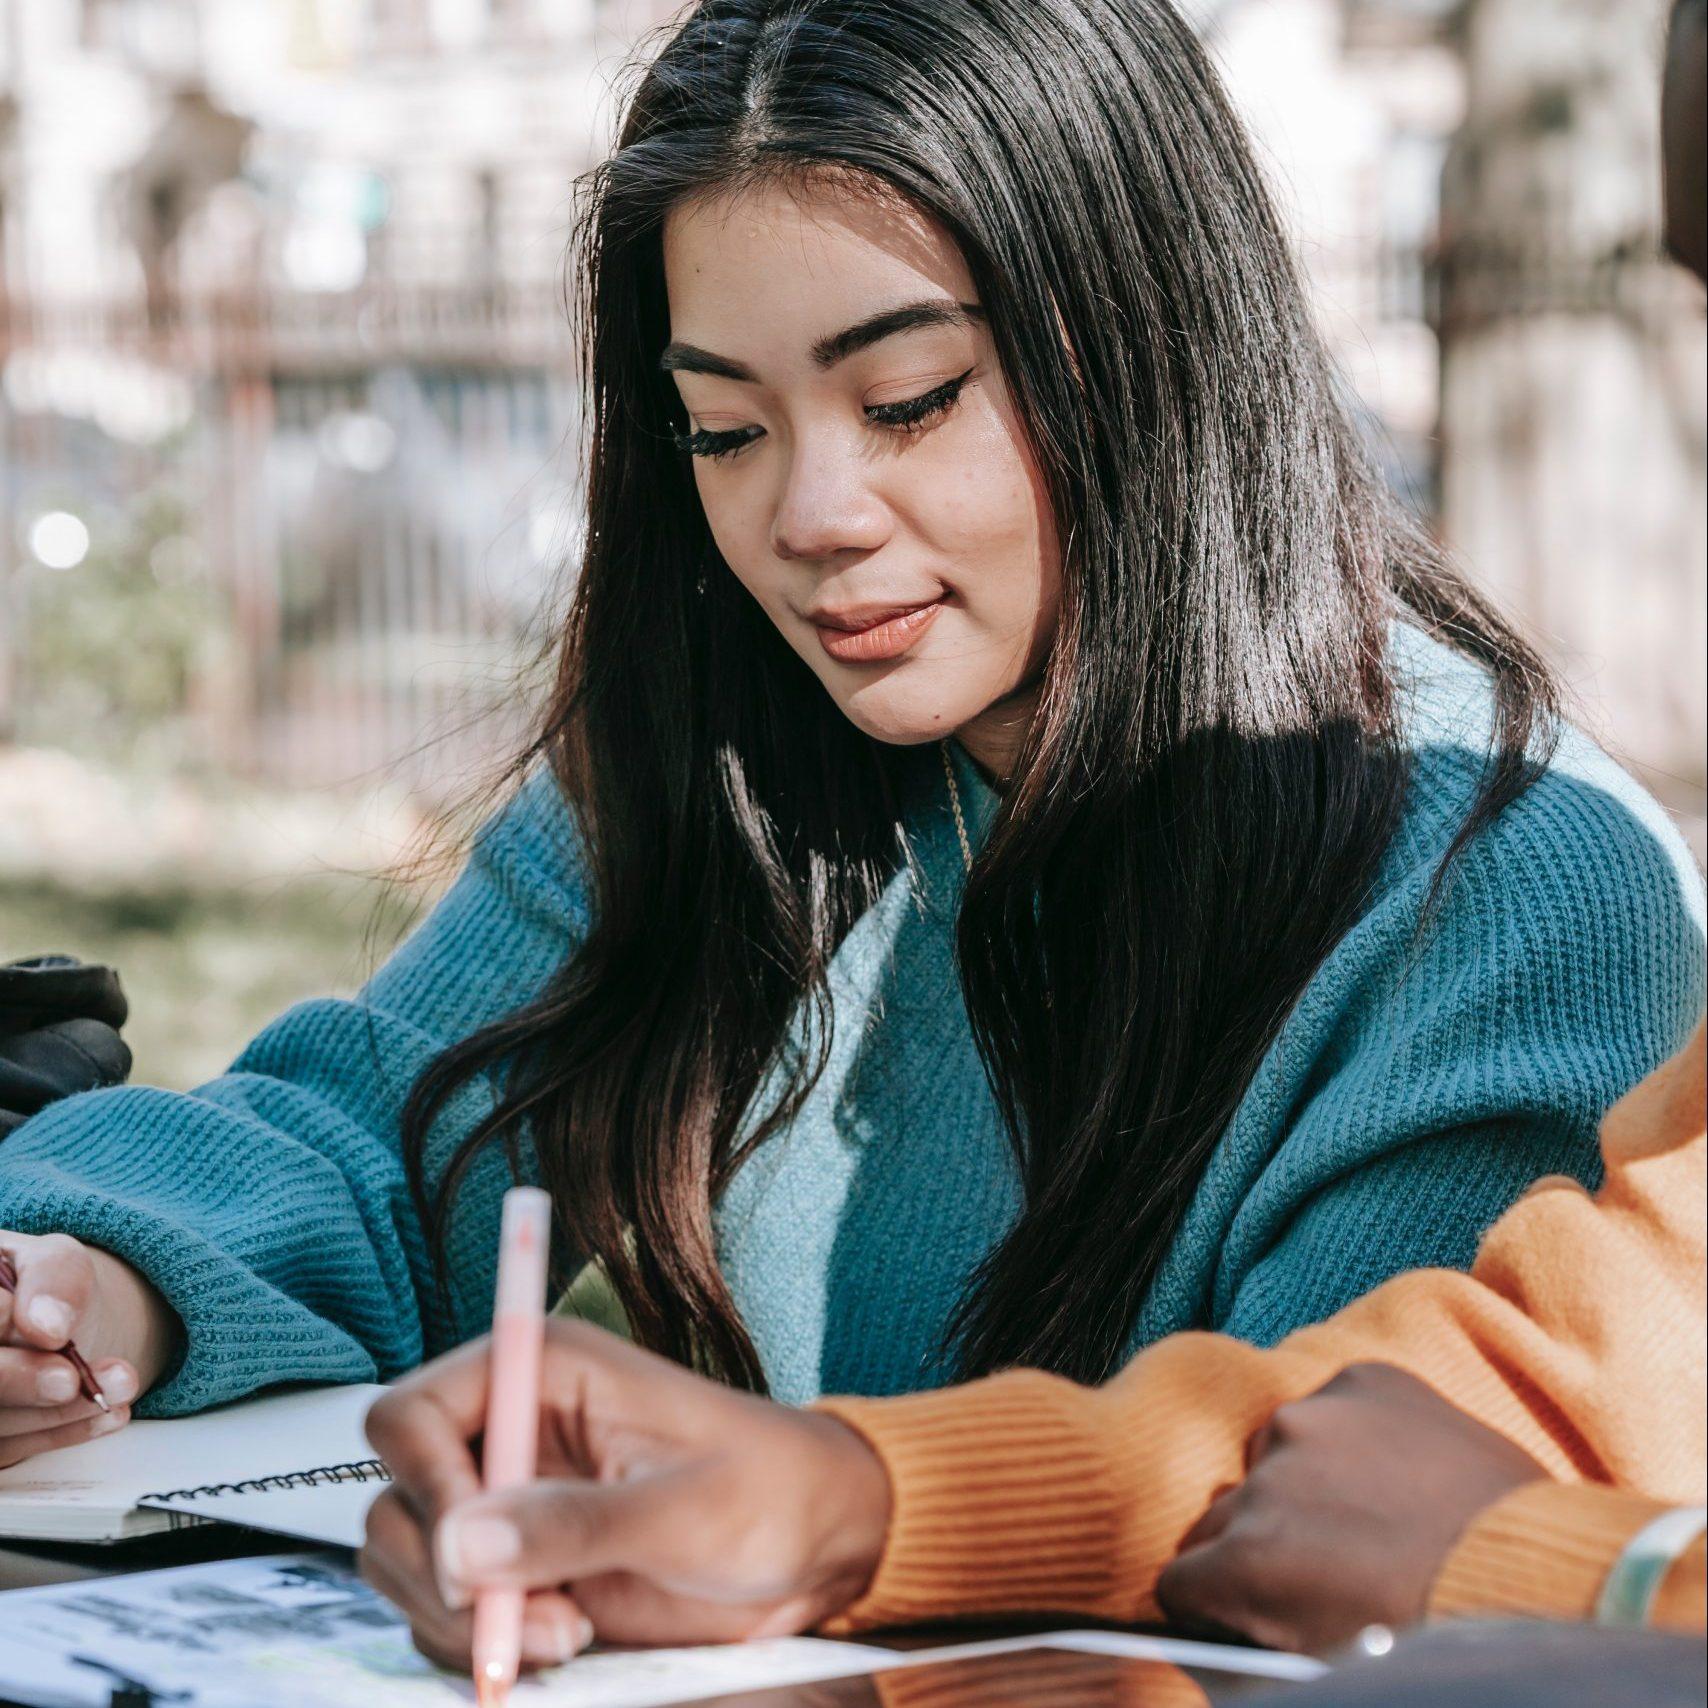 High School Student Doing Homework